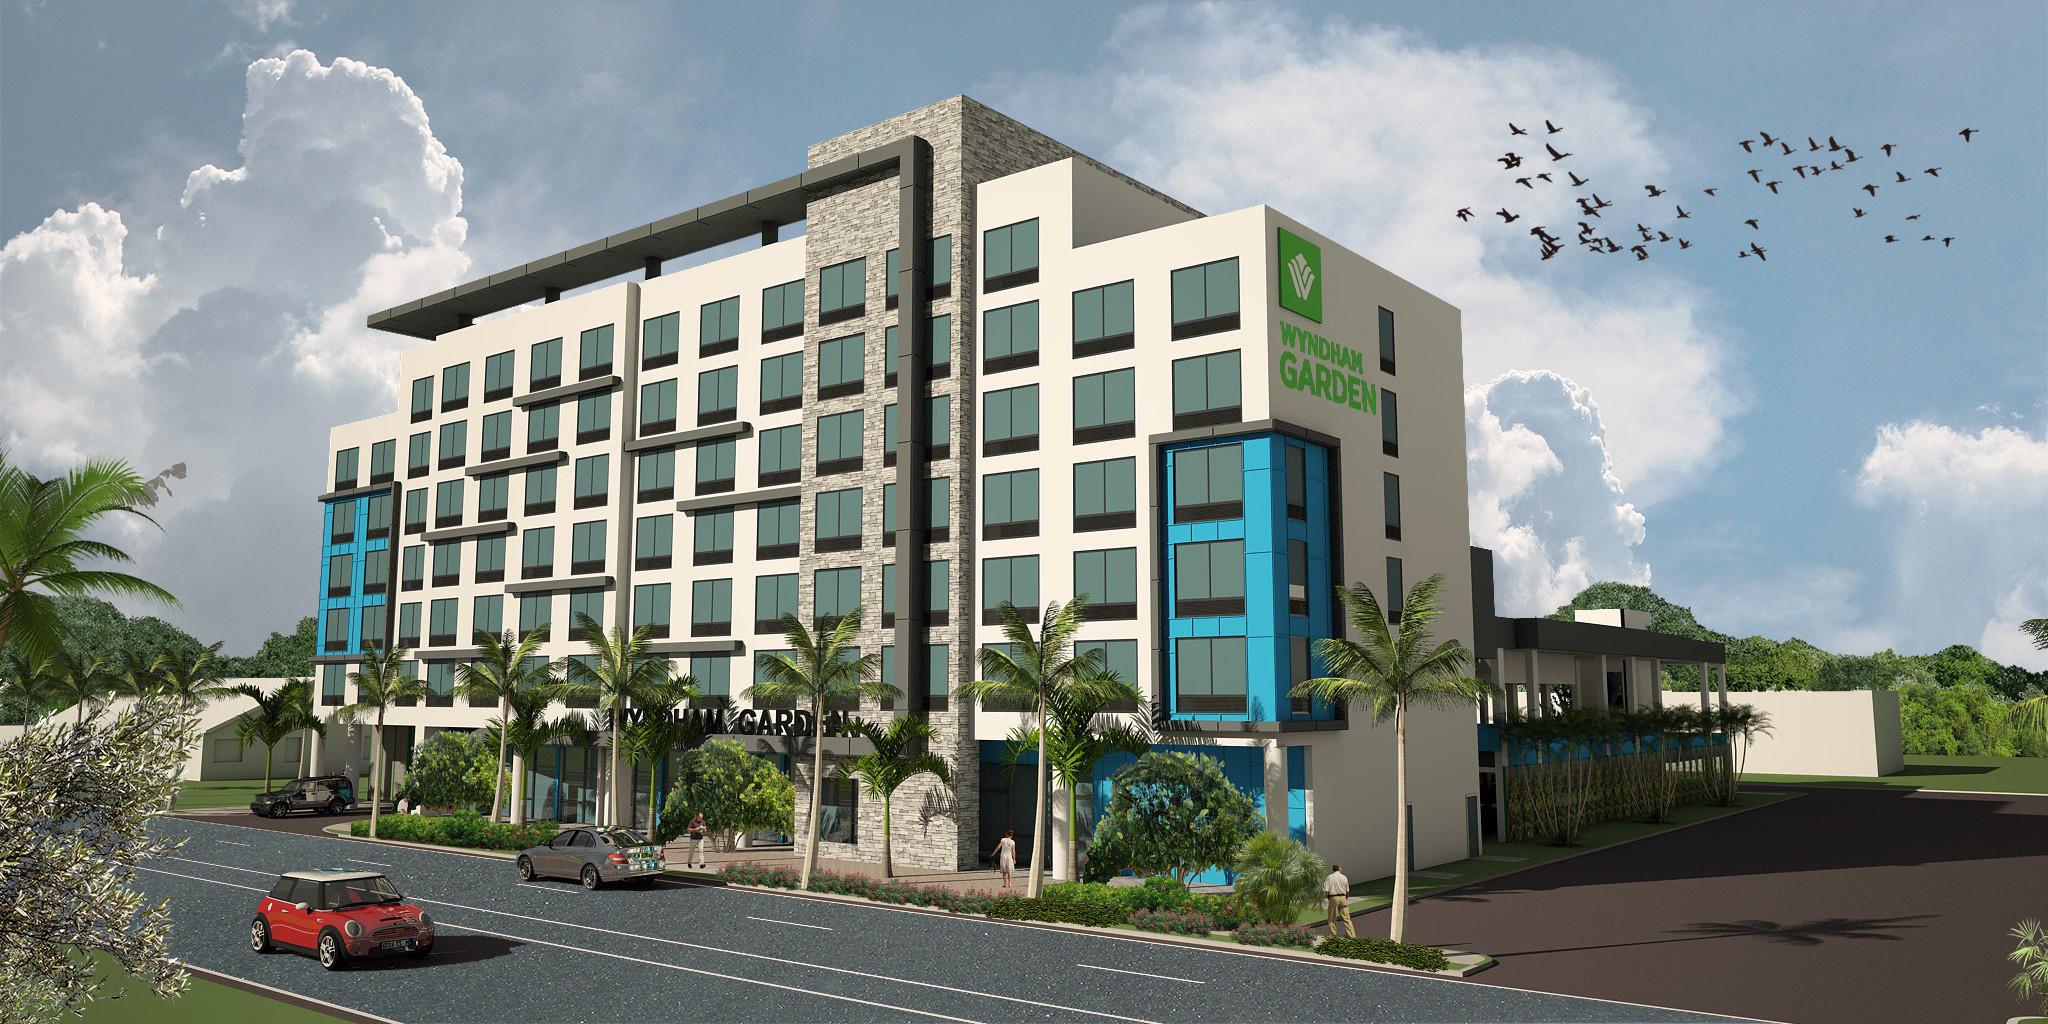 Construction Begins On New Wyndham Garden Hotel In Dania Beach Sun Sentinel